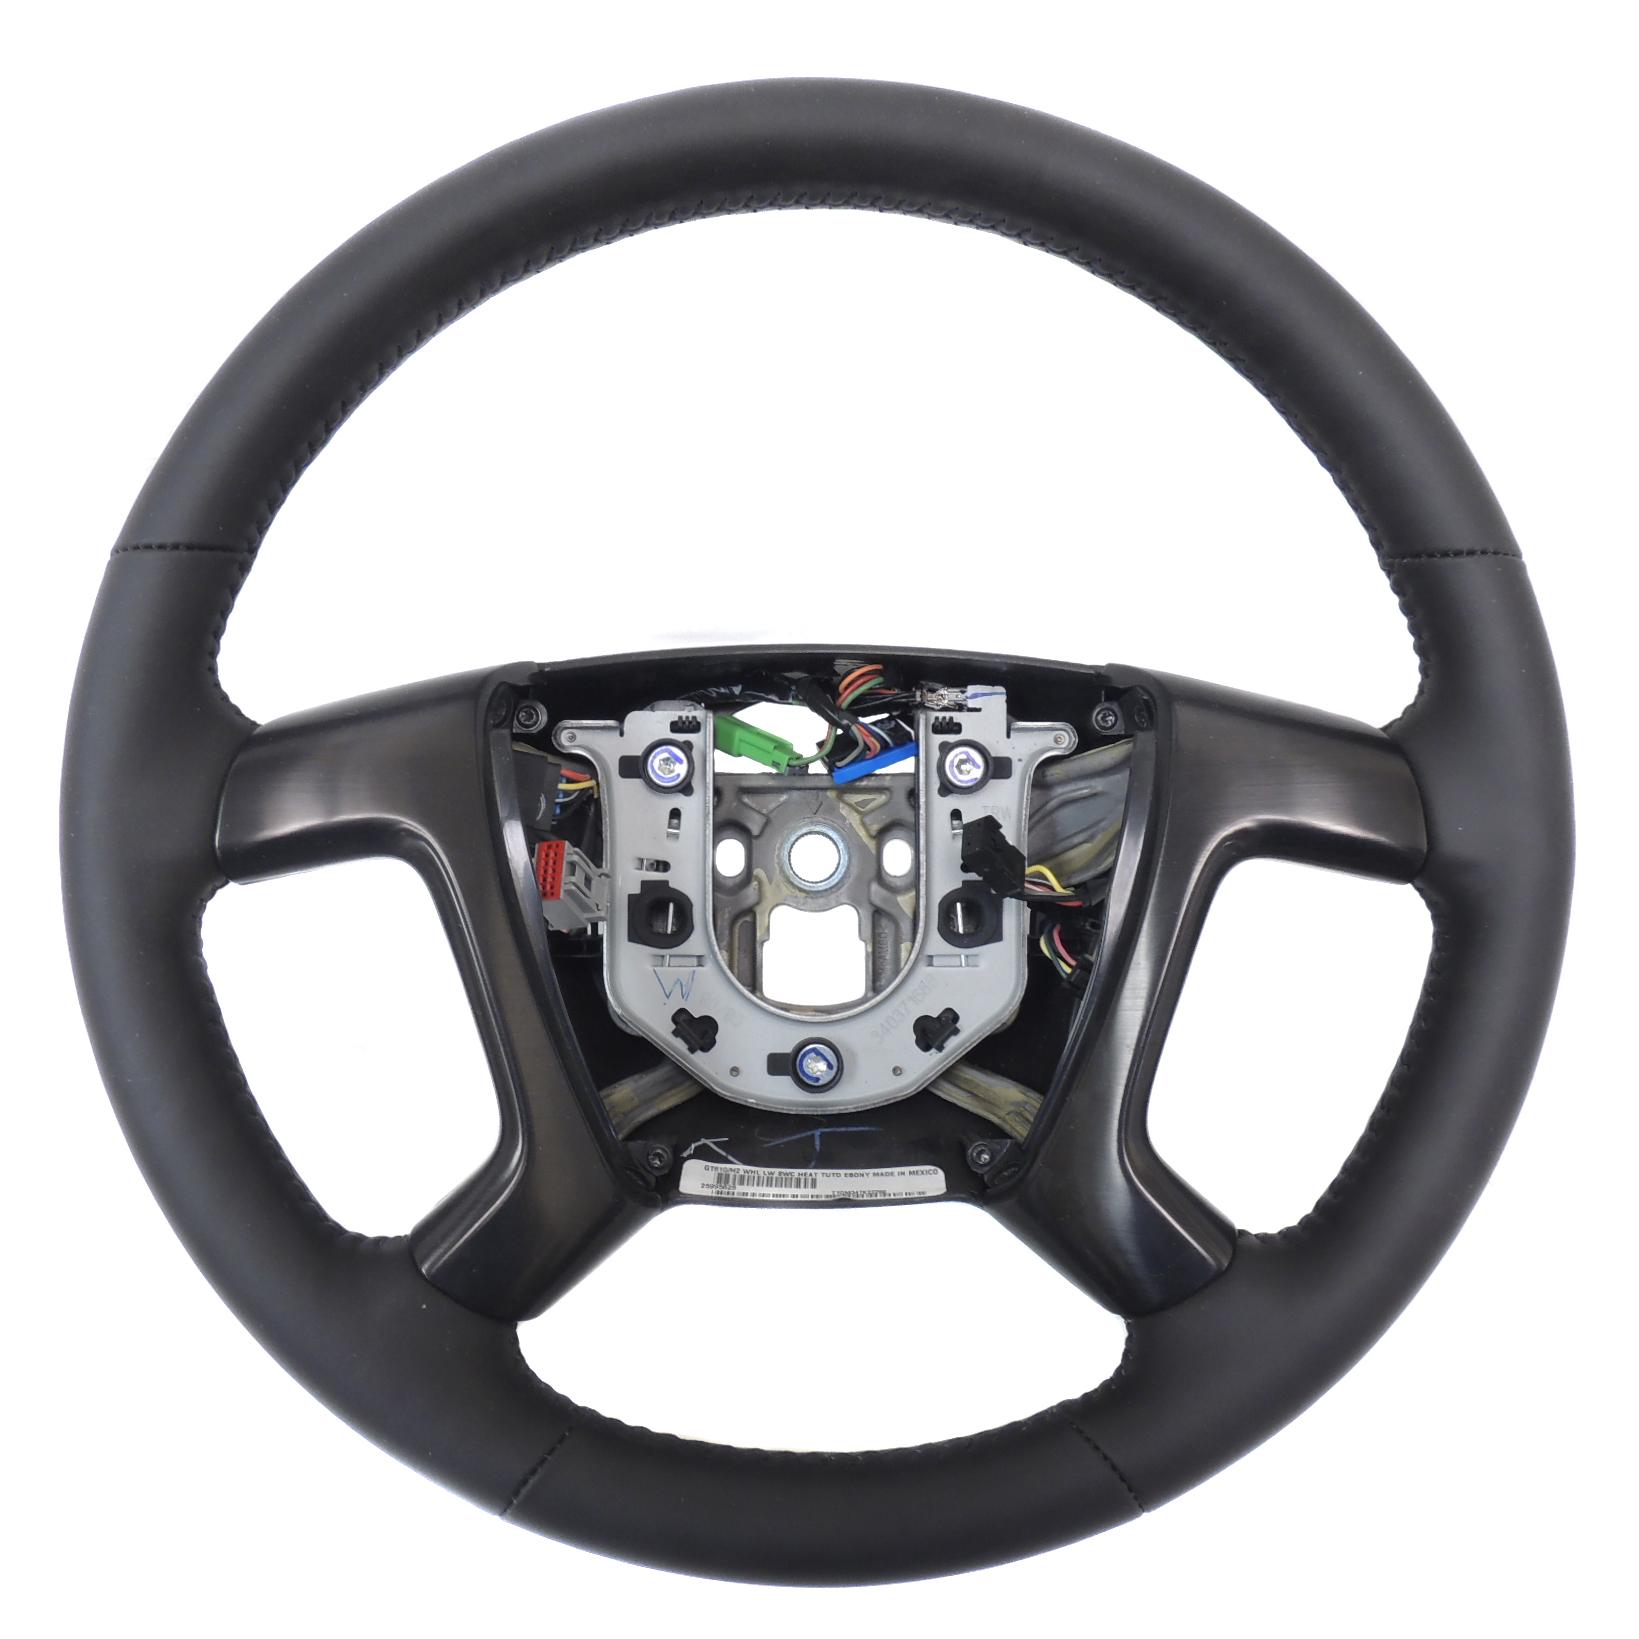 2009 hummer h2 black leather heated steering wheel w. Black Bedroom Furniture Sets. Home Design Ideas